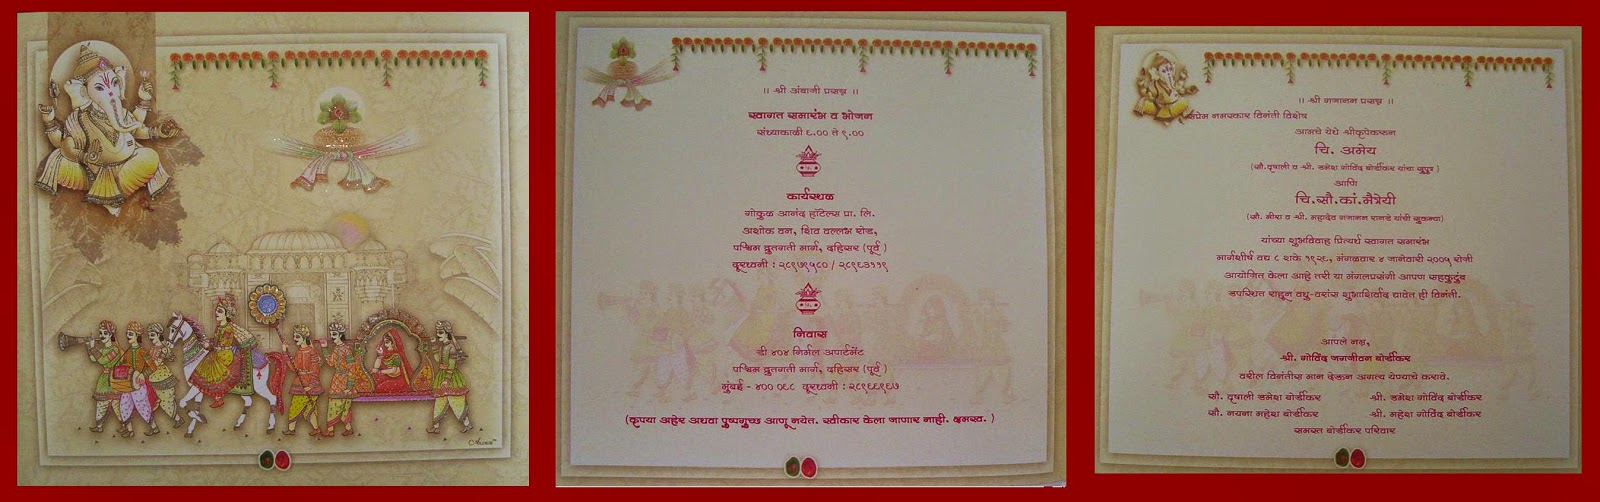 Marathi Lagna Patrika Wordings